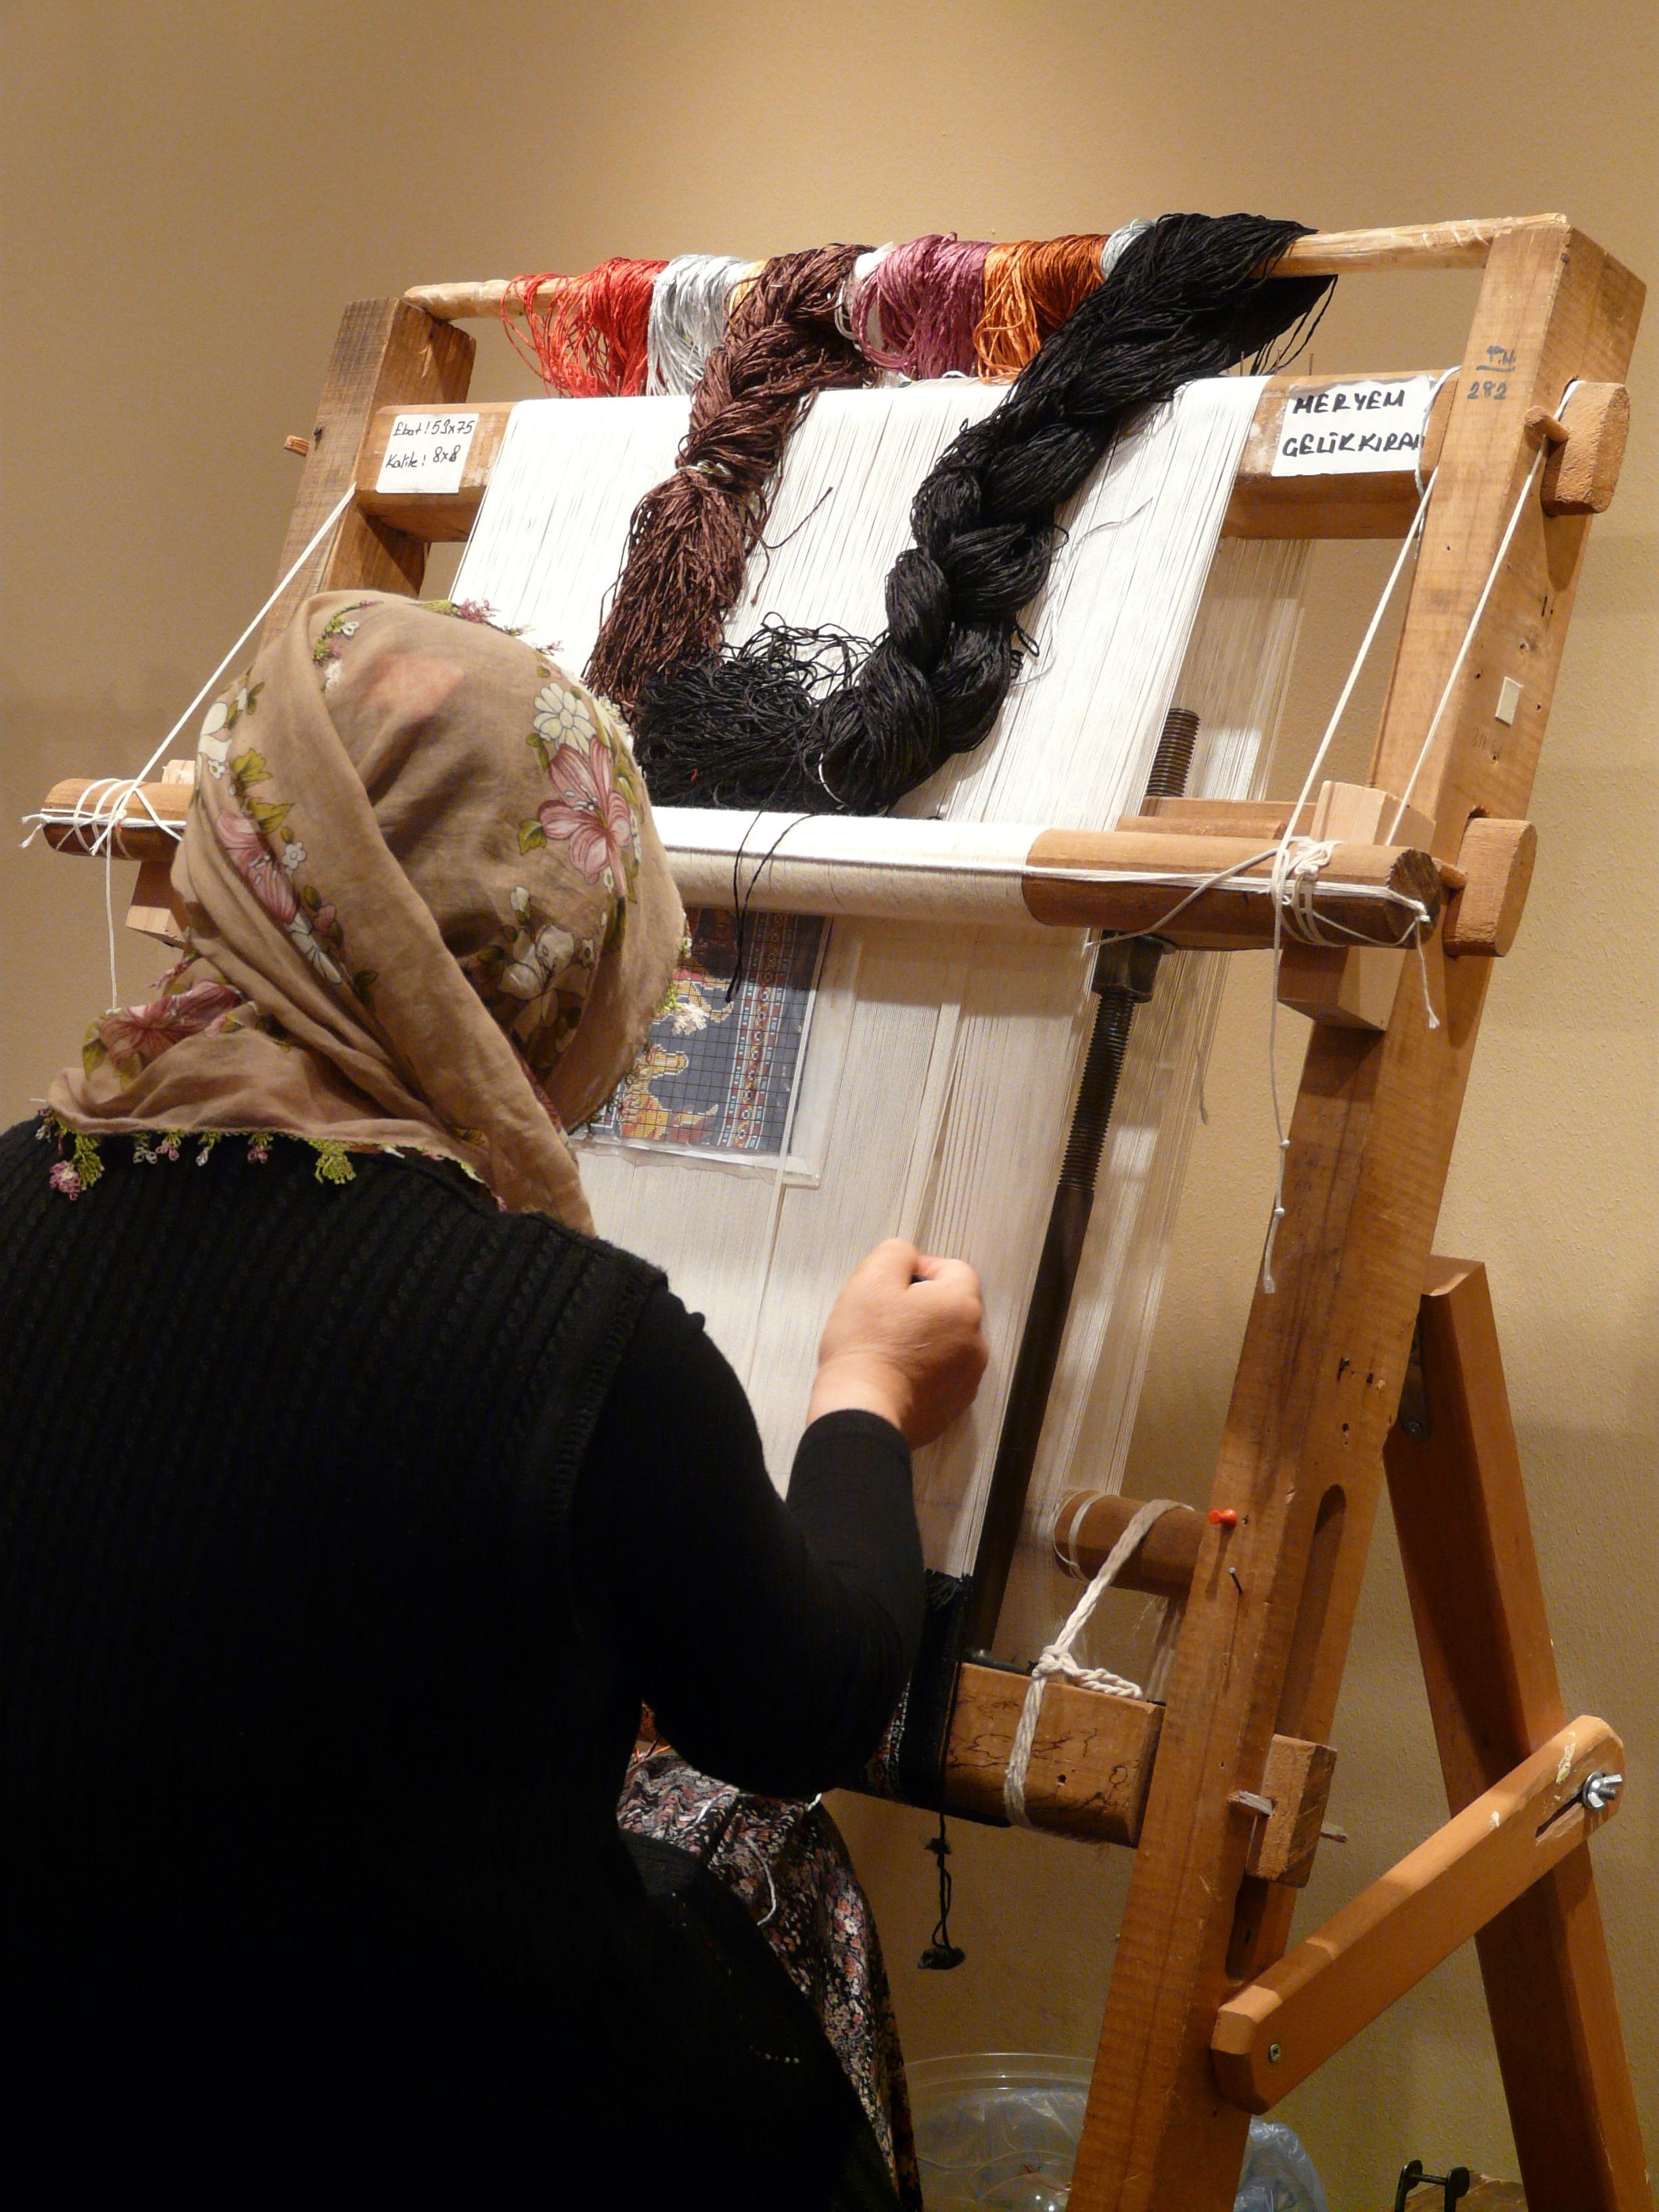 Work Wood Woman Craft Furniture Weave Thread Art Turkey Carpet Cappadocia  Hand Labor Loom Teppichknuepferin